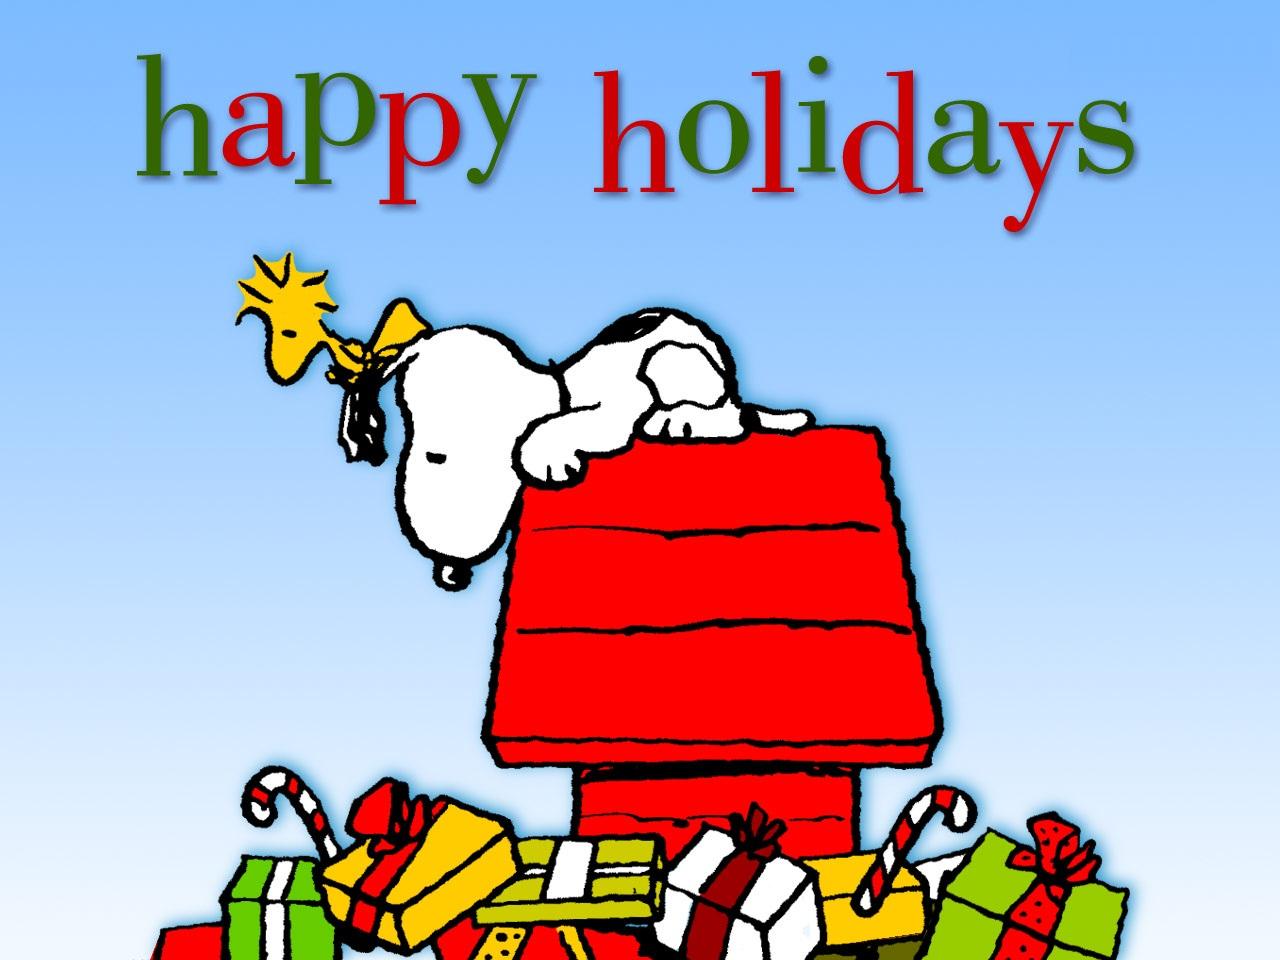 Wallpapers Snoopy Christmas Wallpapers Download Desktop 1280x960